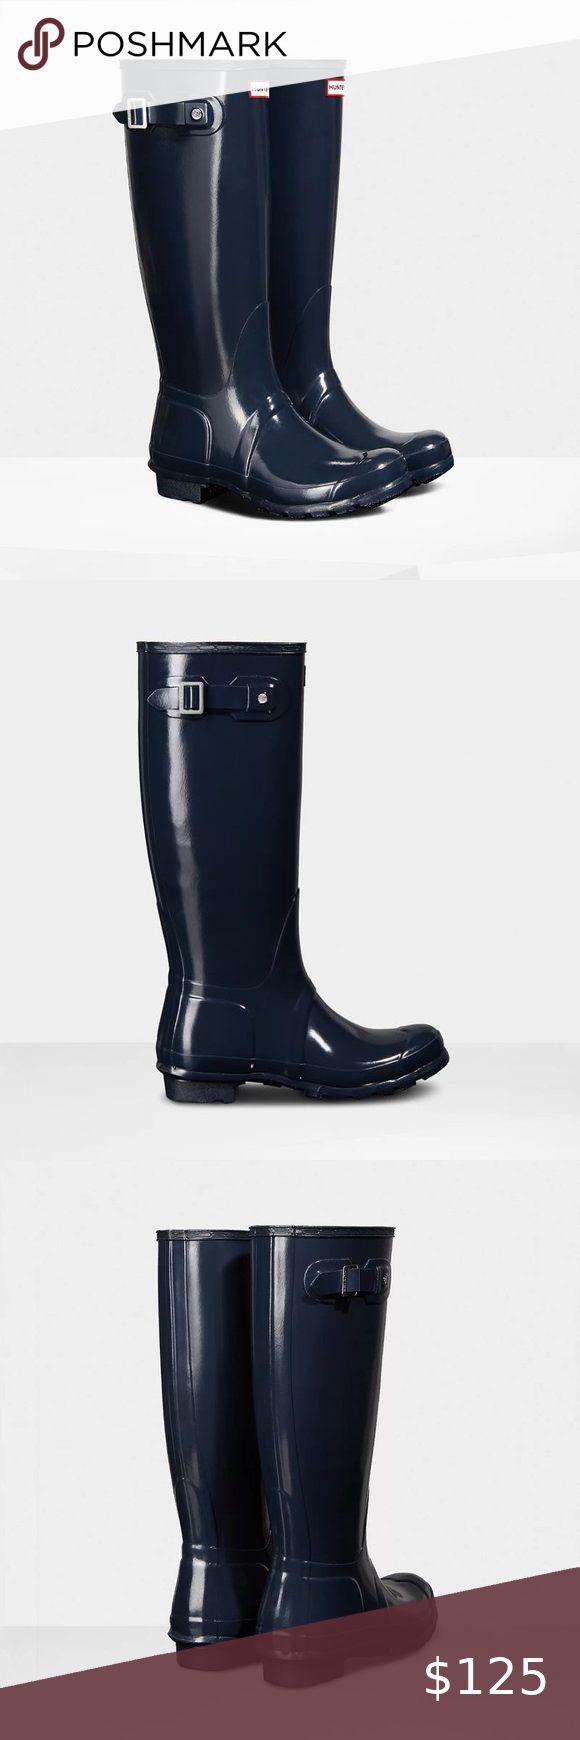 Hunter Original Tall Navy Gloss Rain Boots Sz 6 Stylish -6967